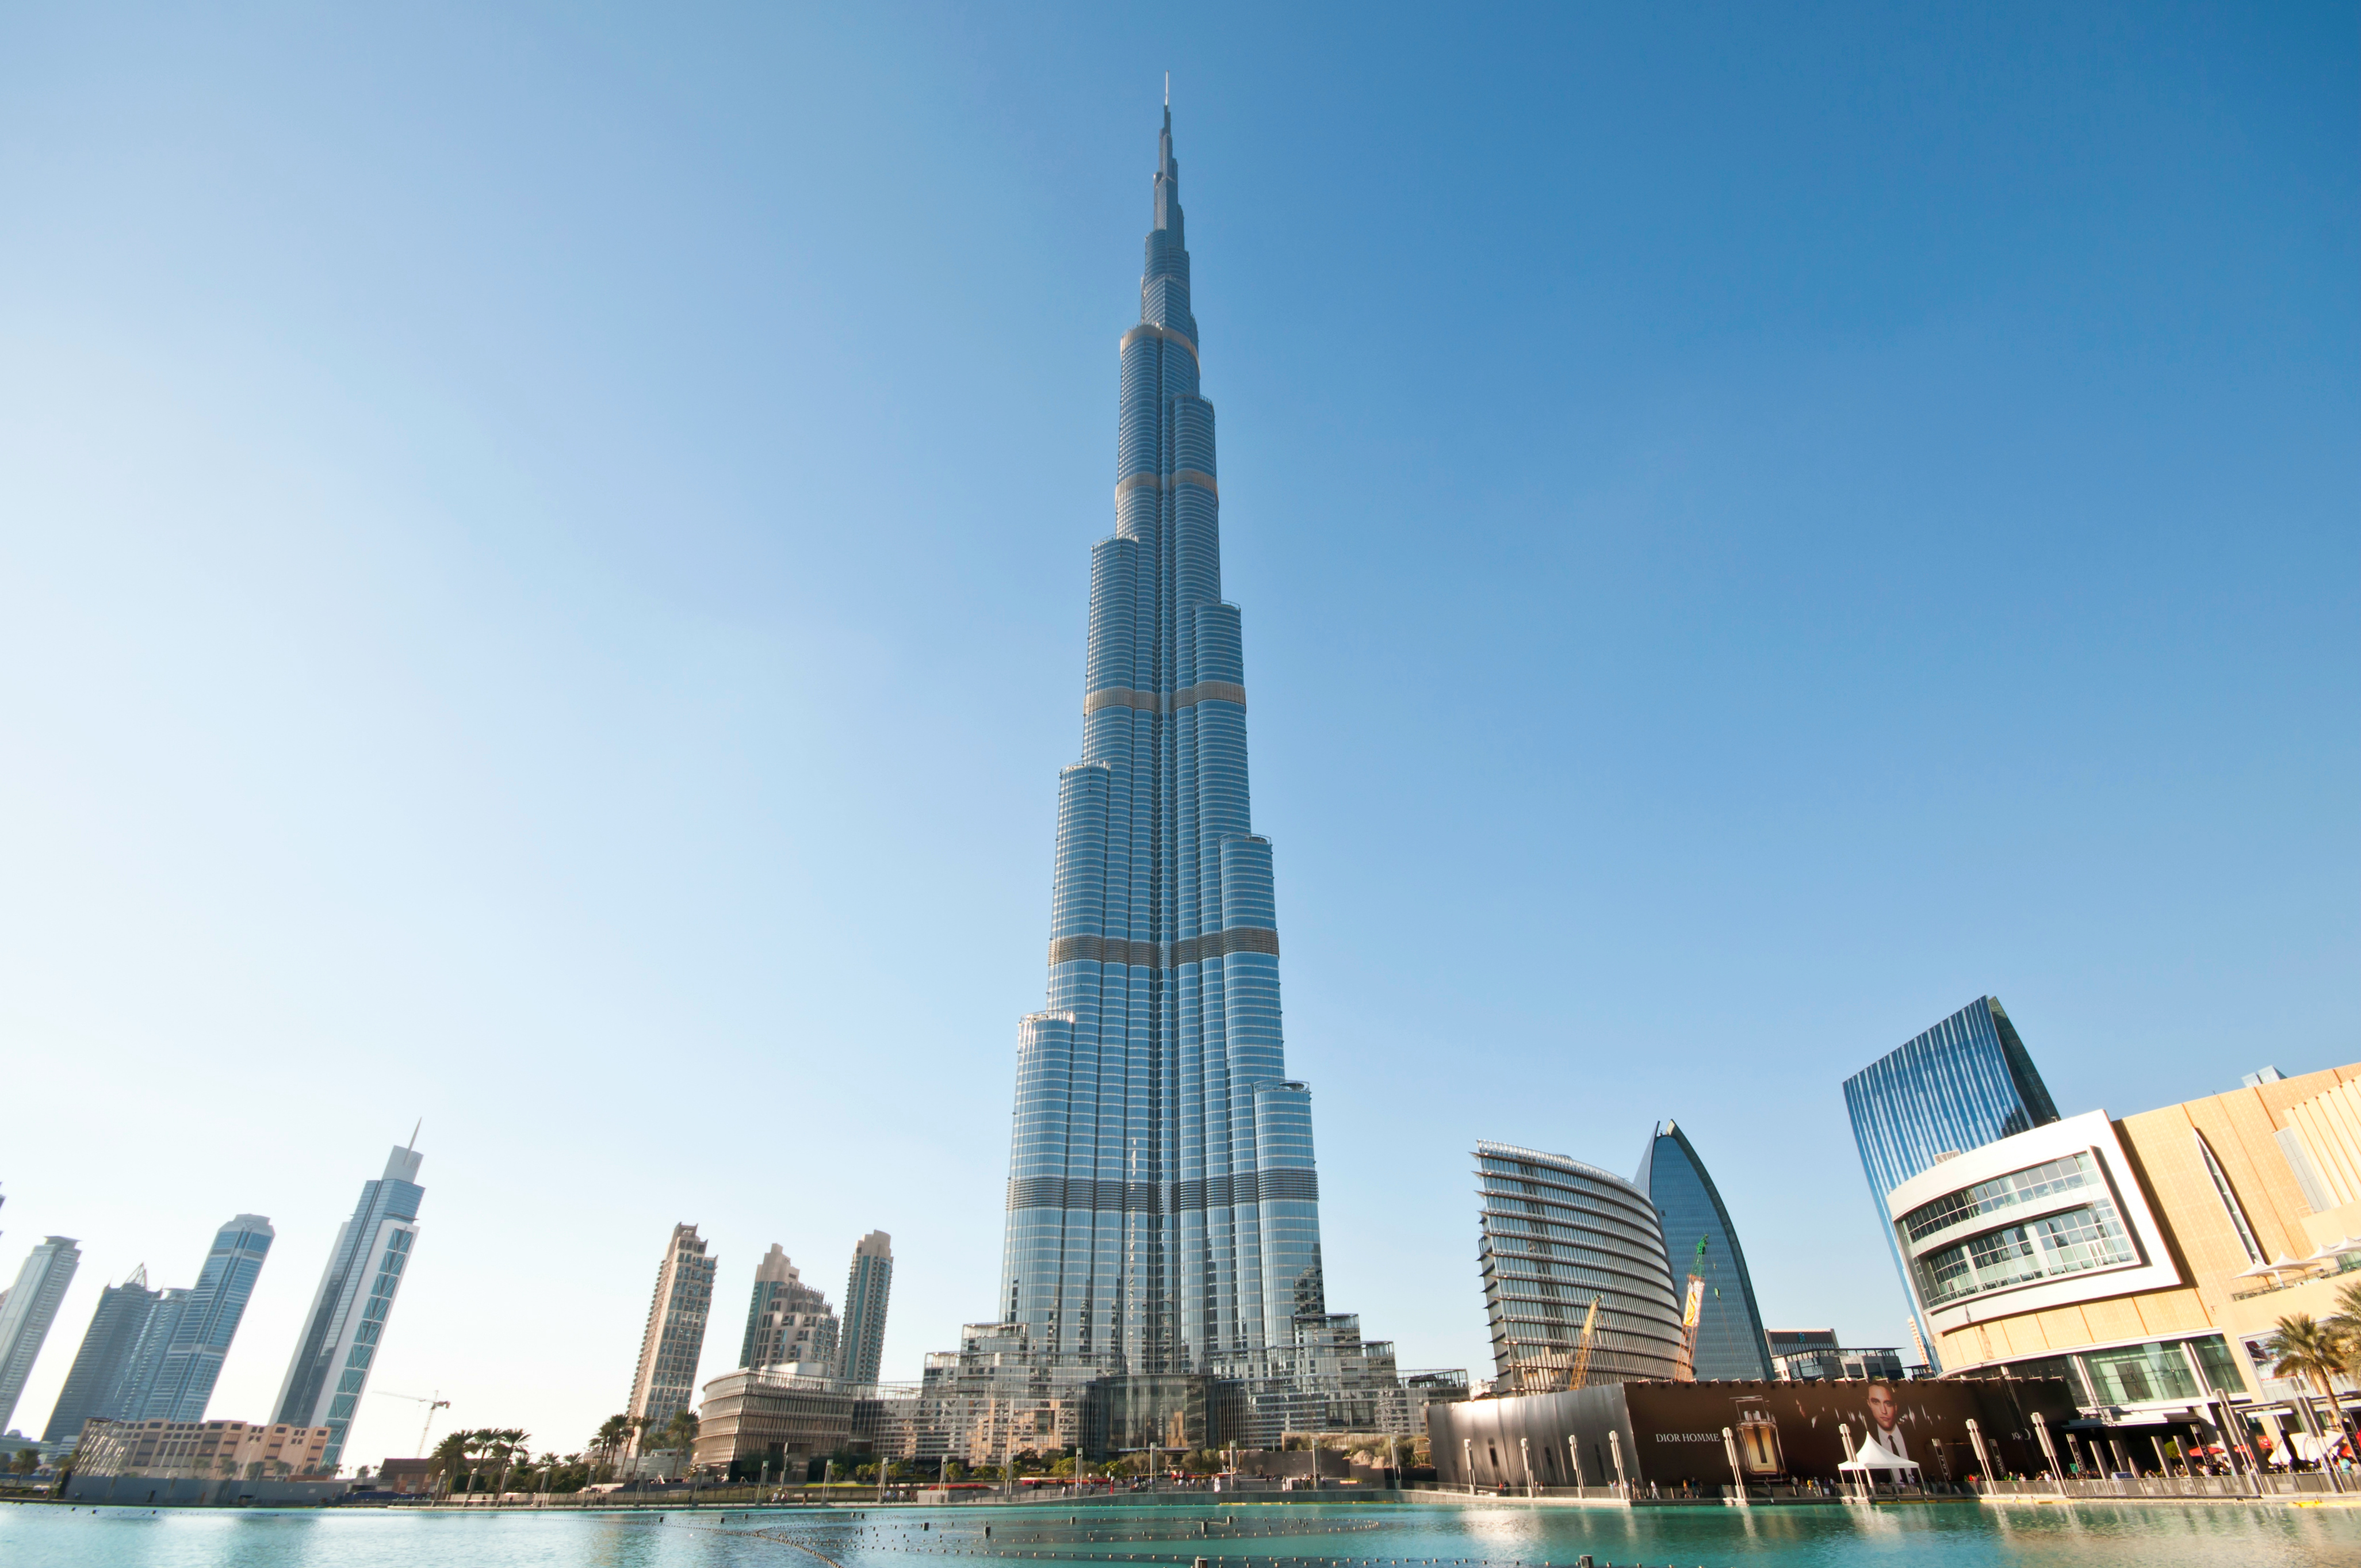 >Burj Khalifa - 124th Floor